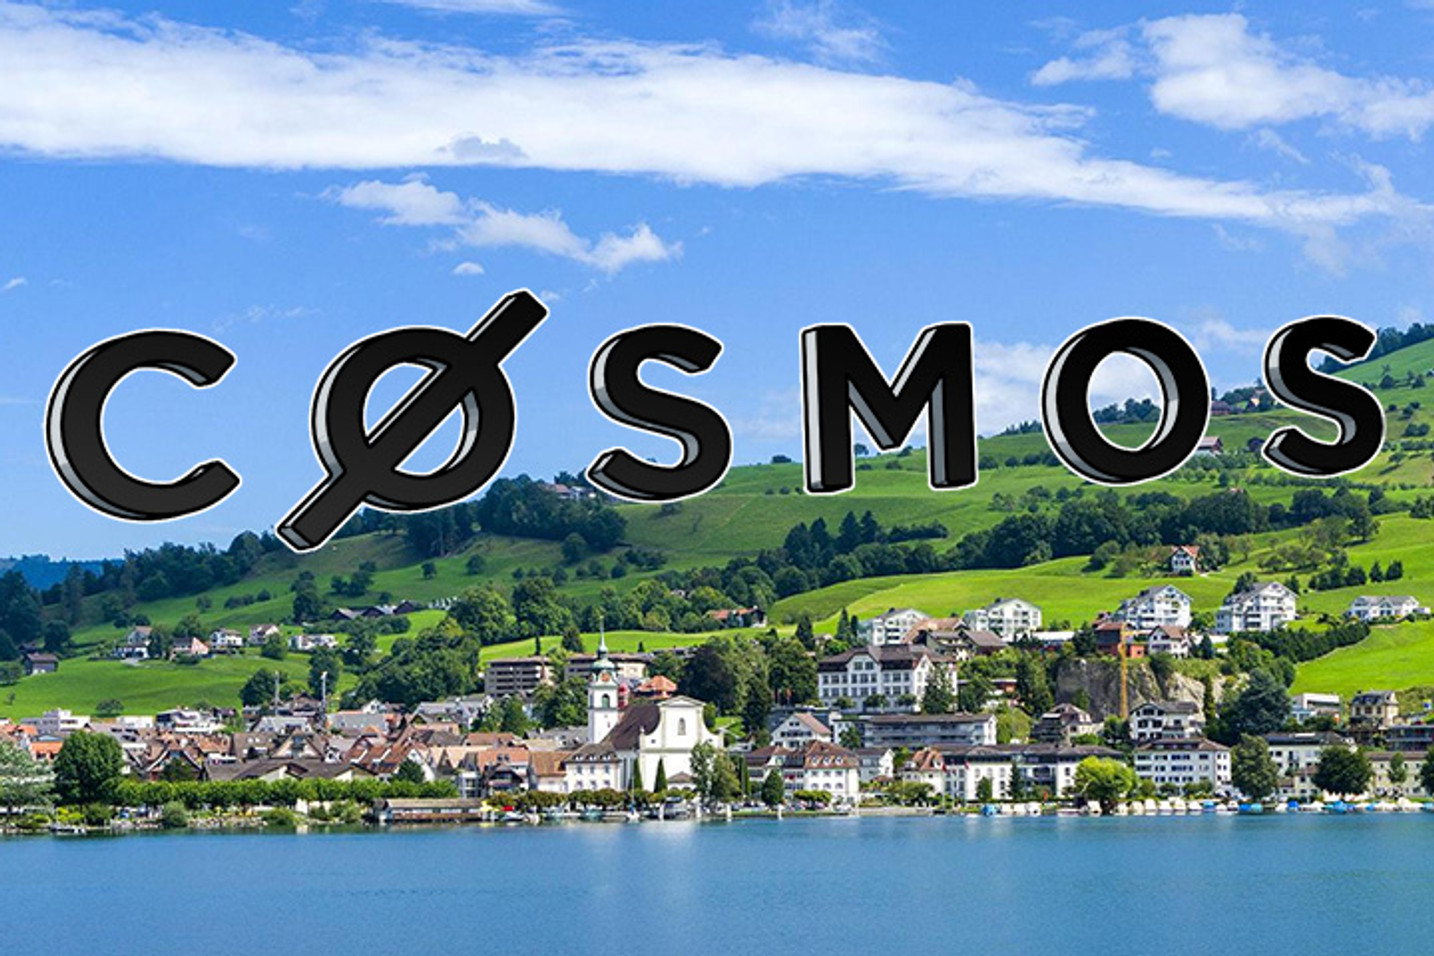 Cosmos Announces Fundraiser to Build Internet of Blockchains